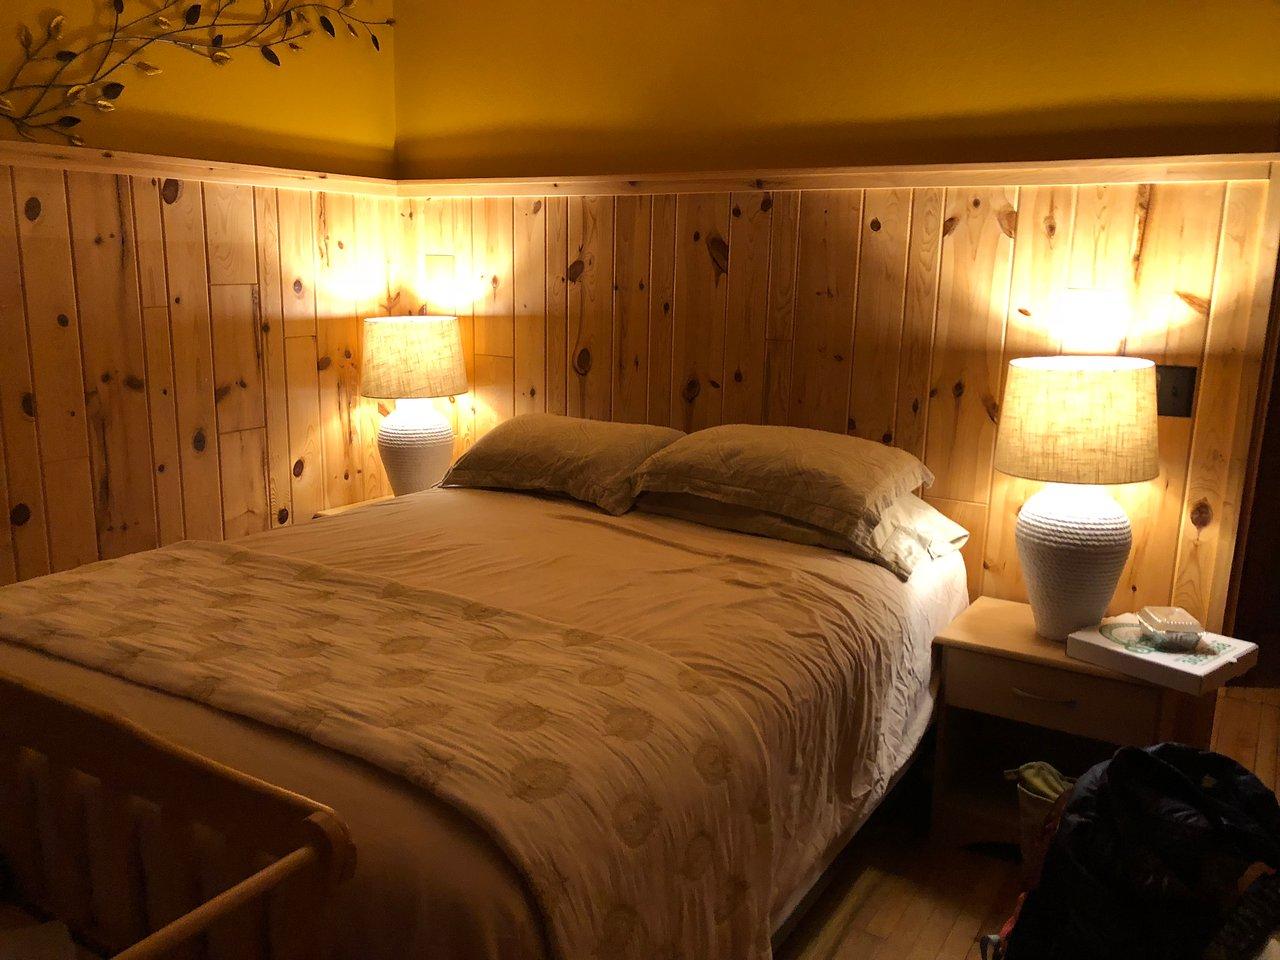 stay inn ely 110 1 3 4 prices guest house reviews mn rh tripadvisor com